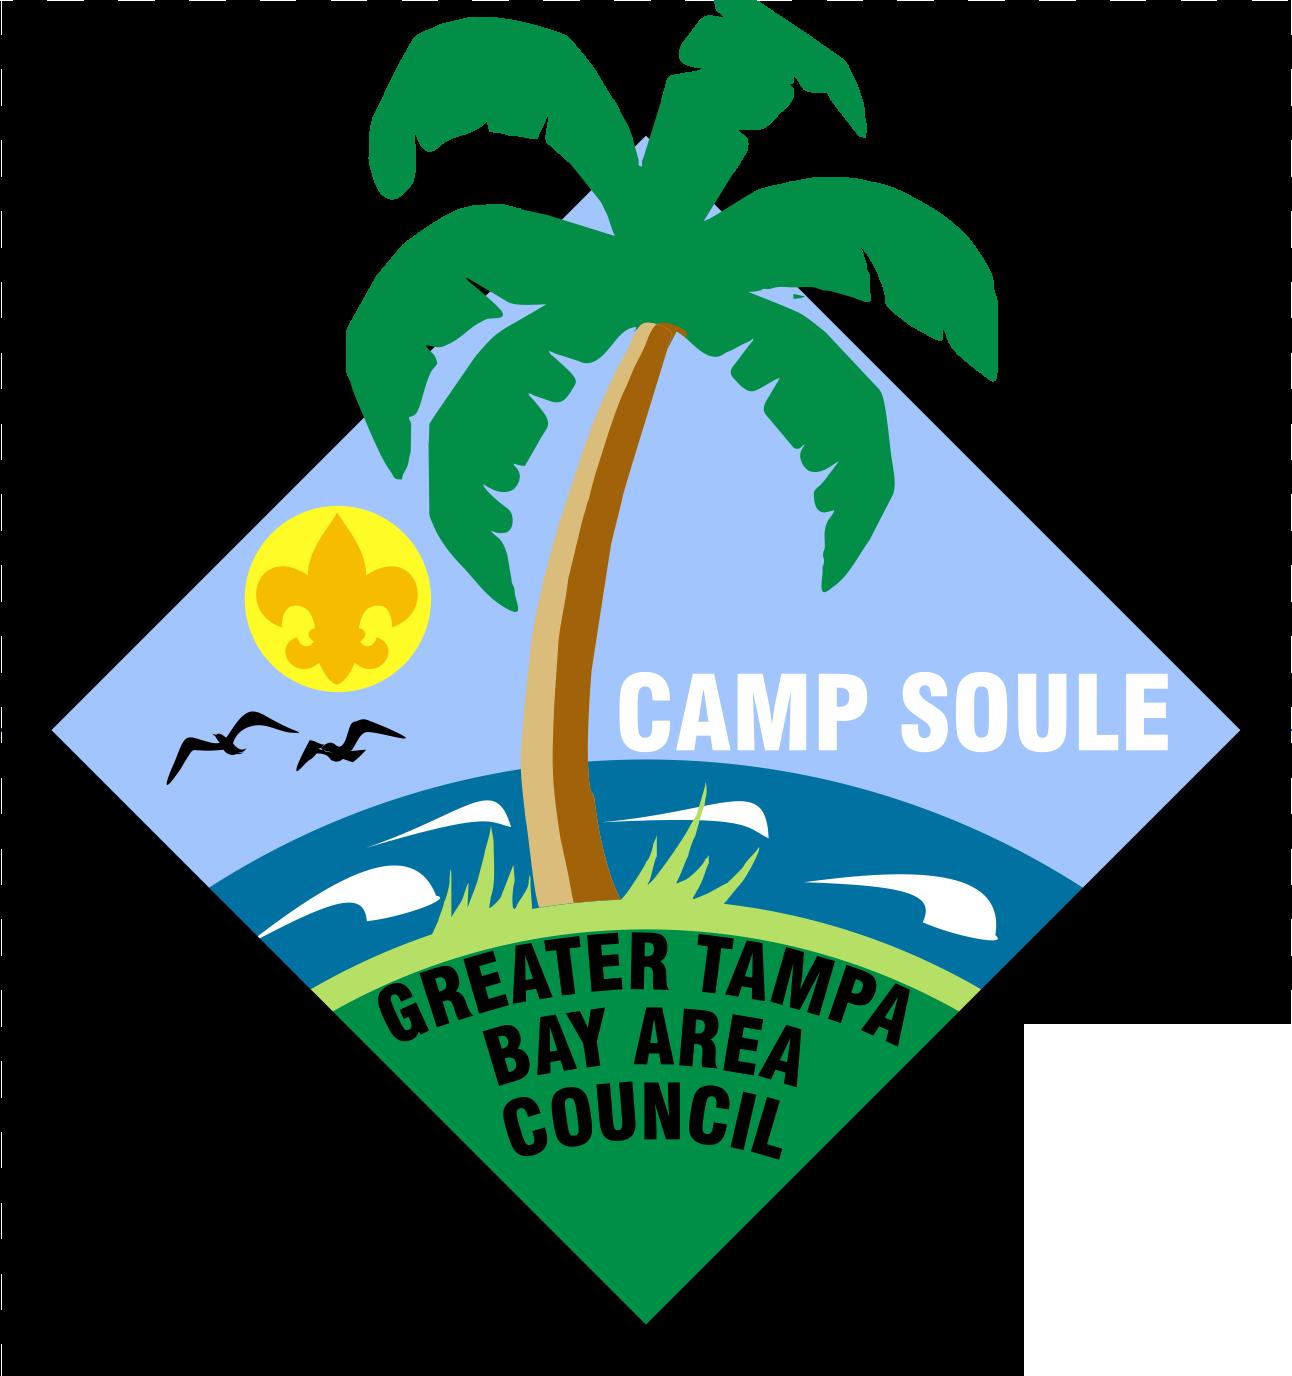 Camp Soule Logo